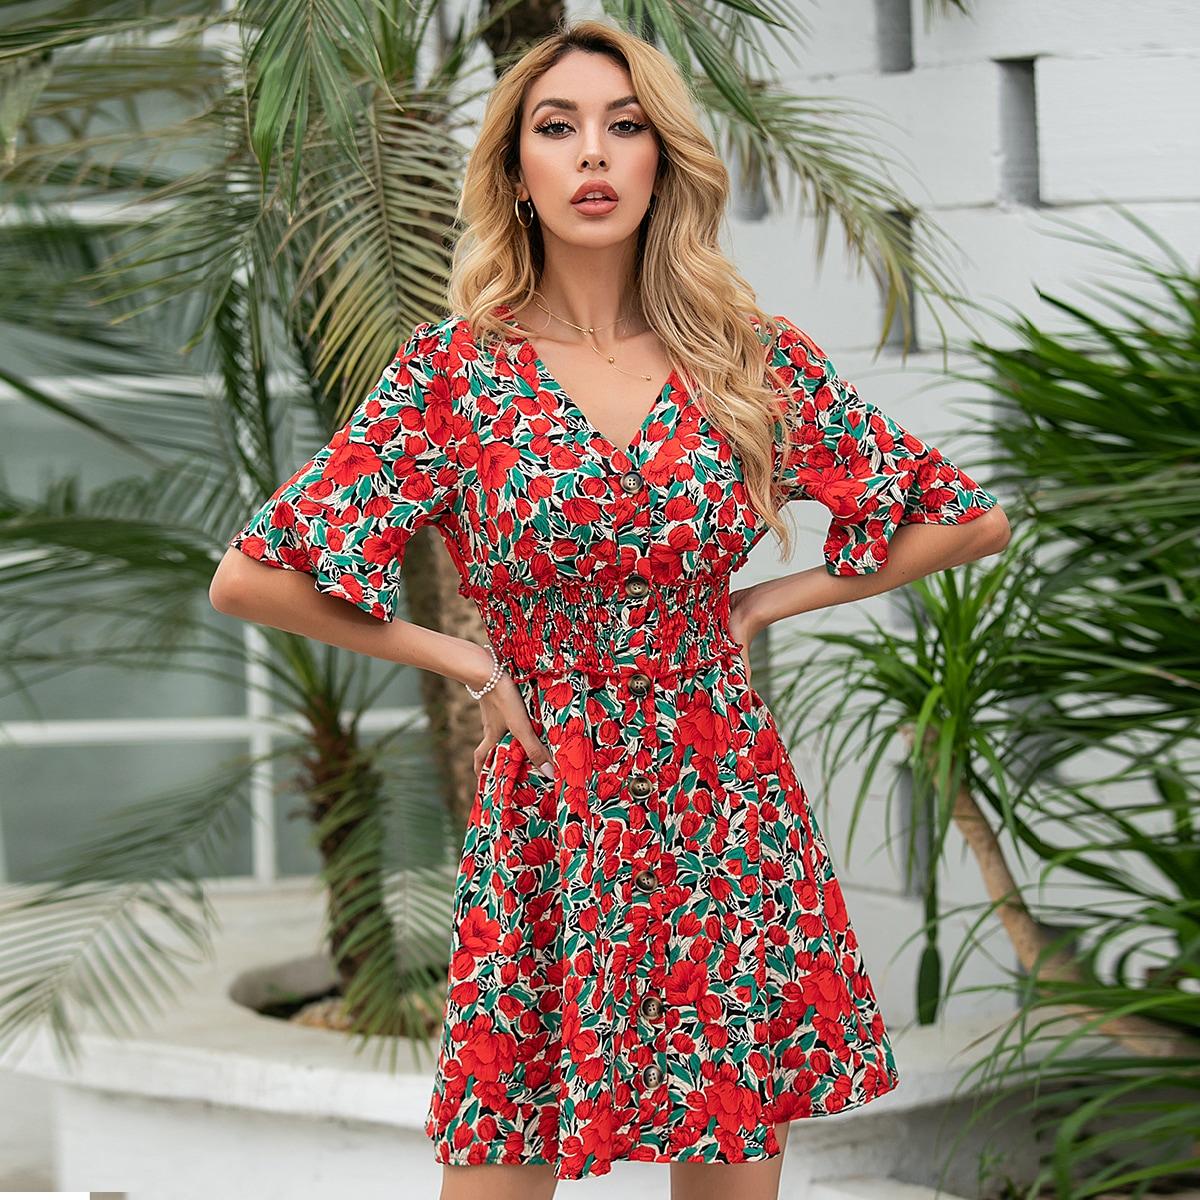 SHEIN / Allover Floral Print Shirred Waist A-line Dress